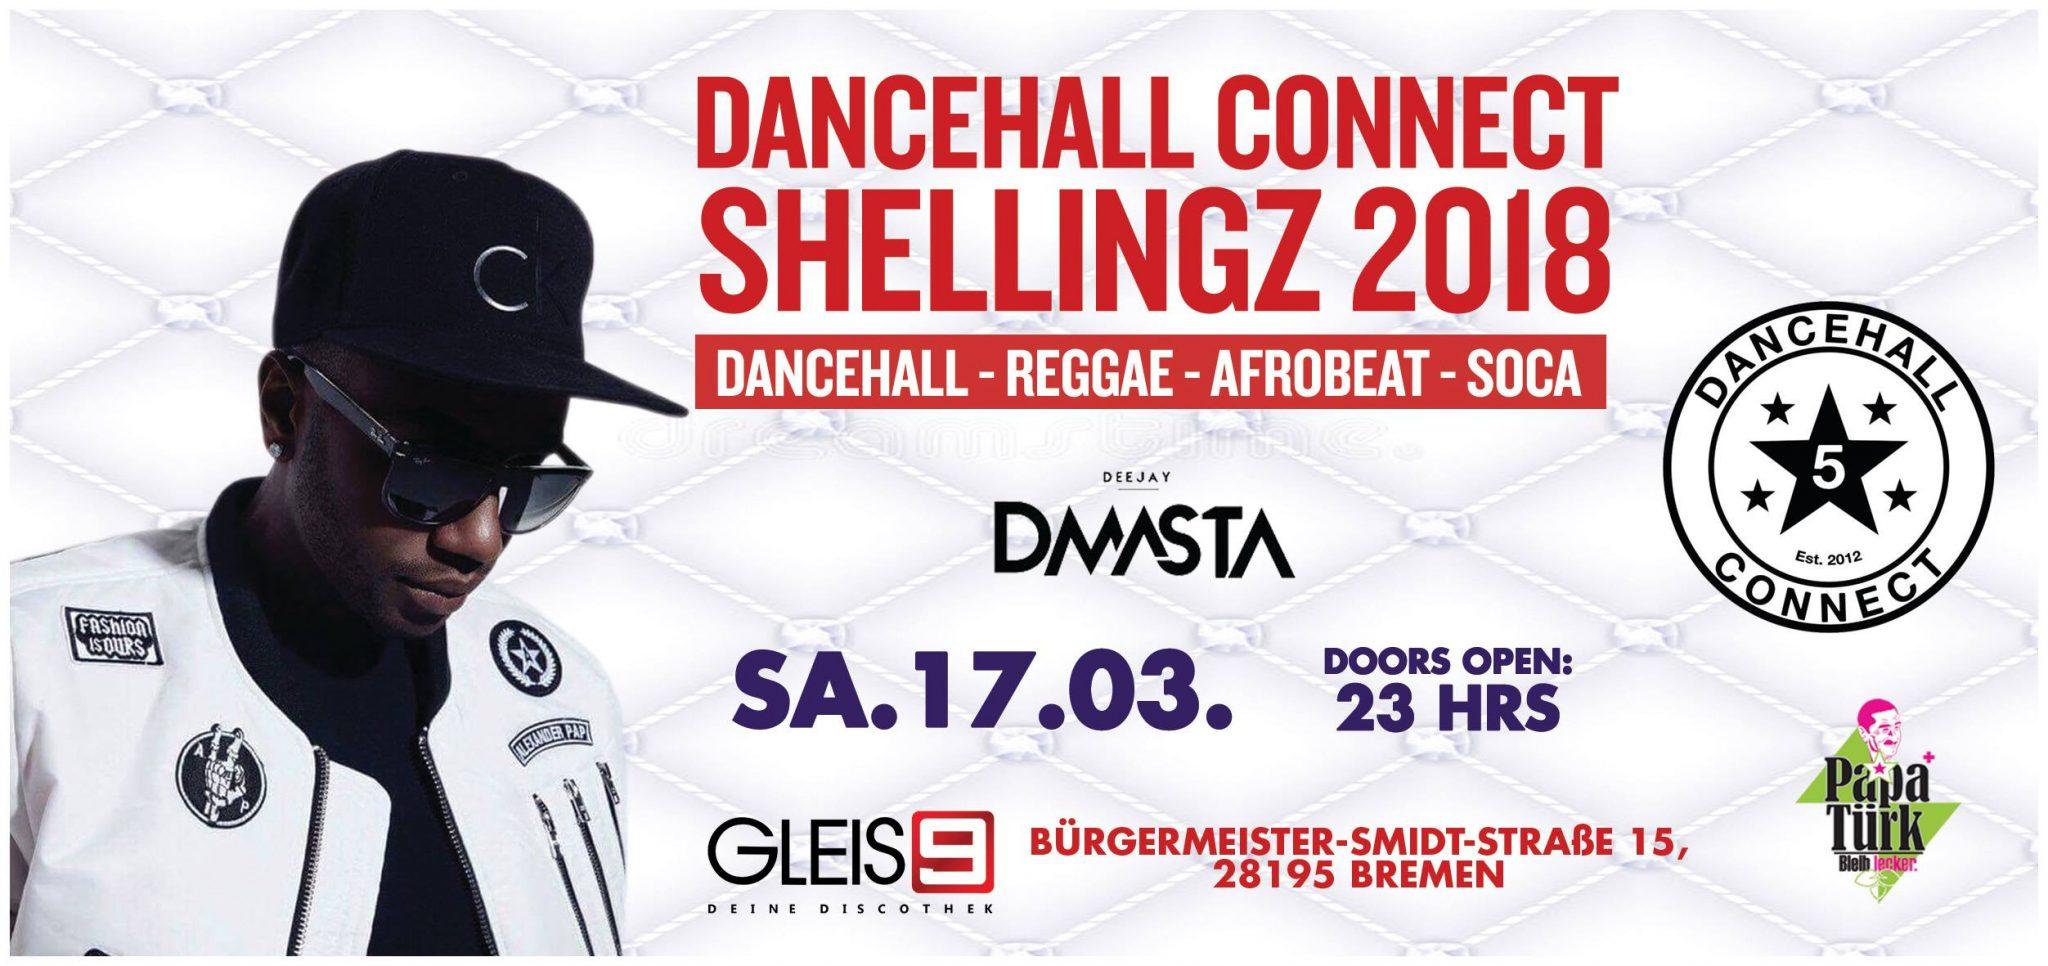 Dancehall CoNNect Shellingz